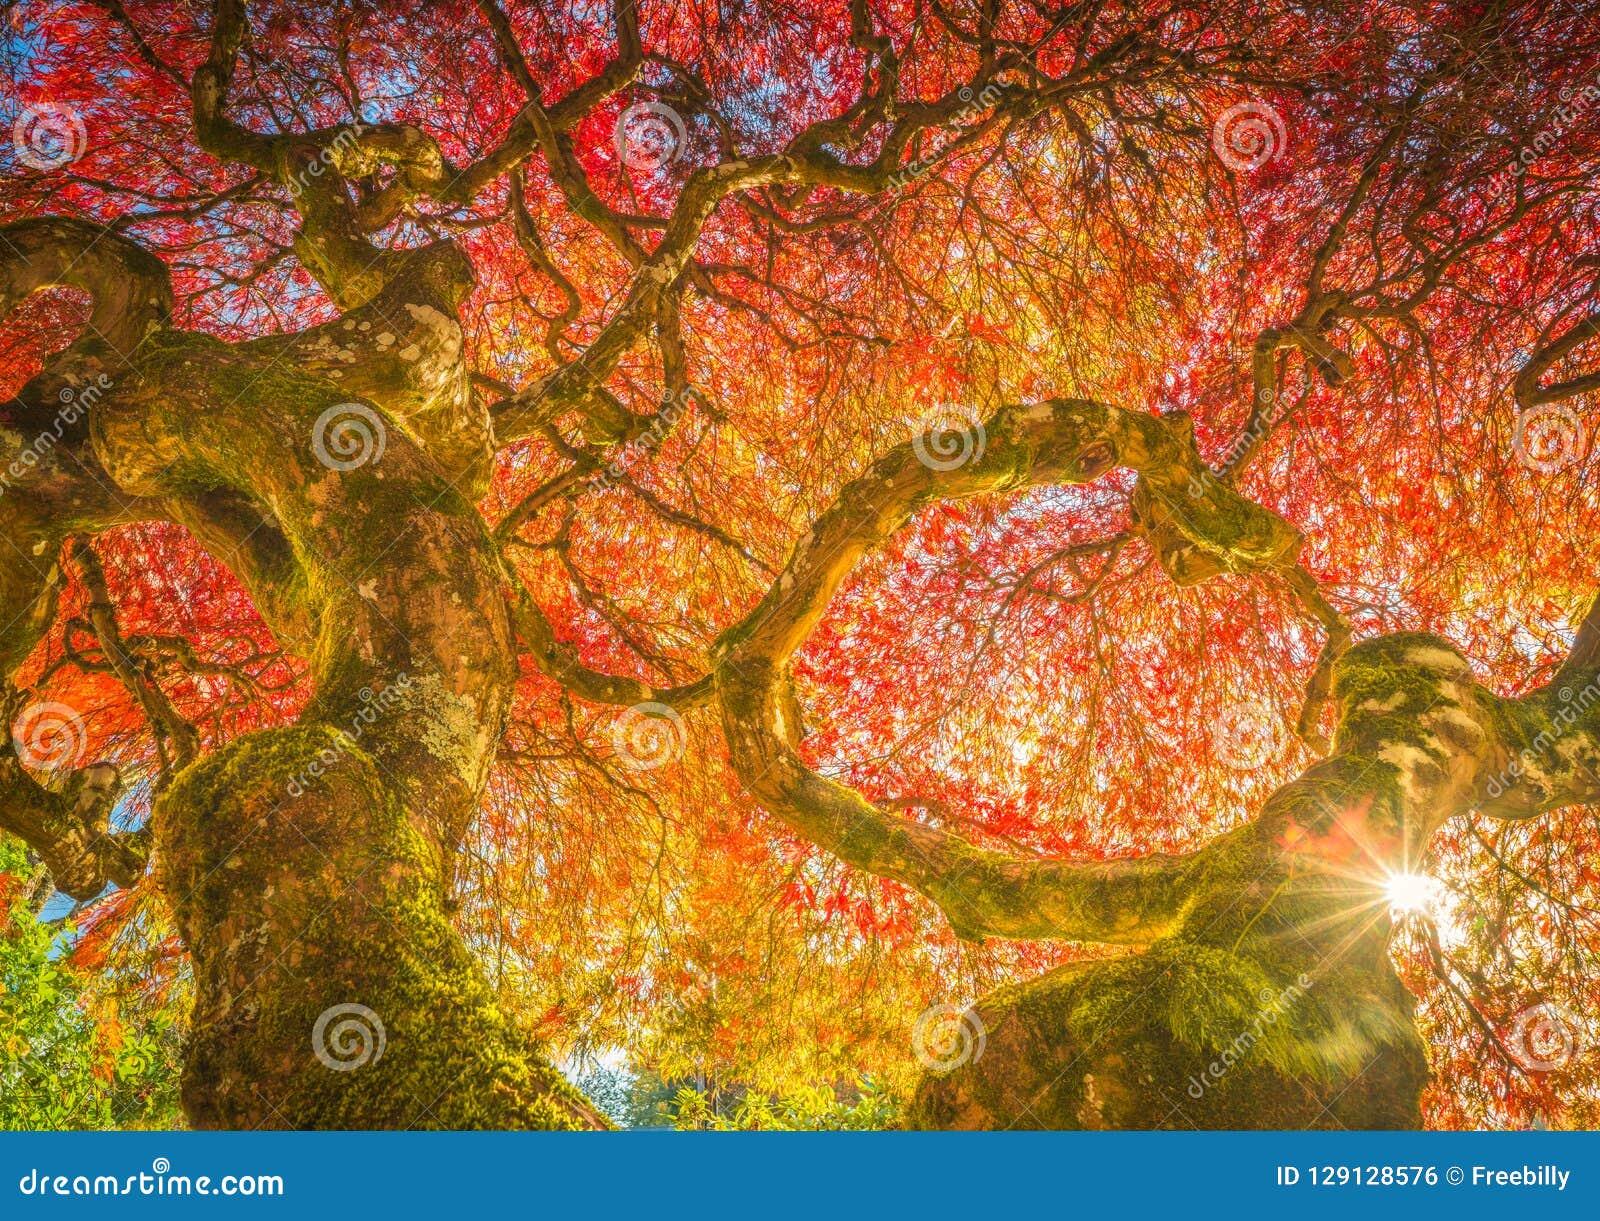 Jahrhundert-japanischer Ahorn in den Herbstfarben